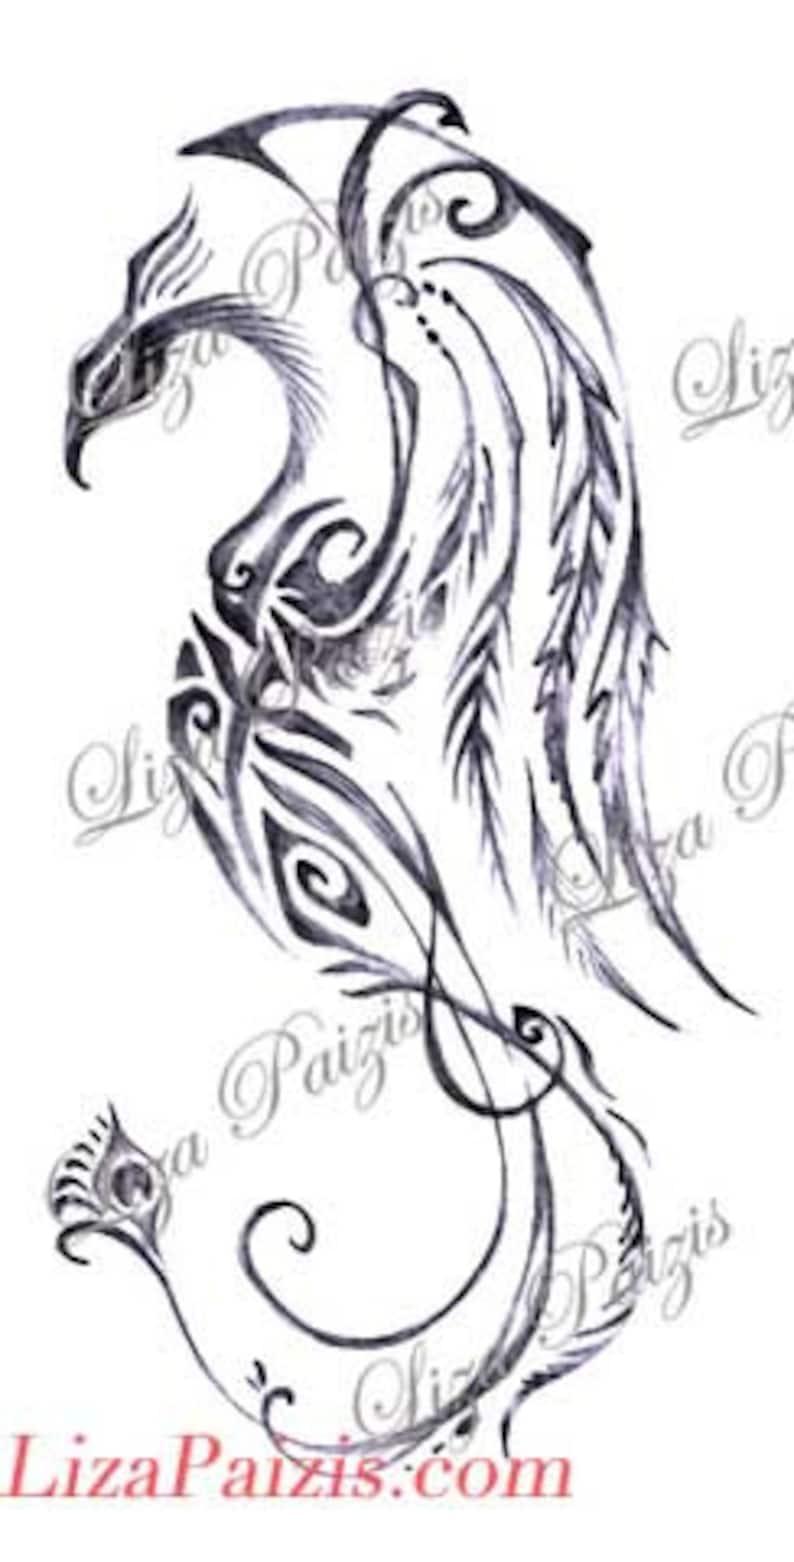 60ab5ebc5 Tribal phoenix dragon with peacock tail black and gray tattoo | Etsy